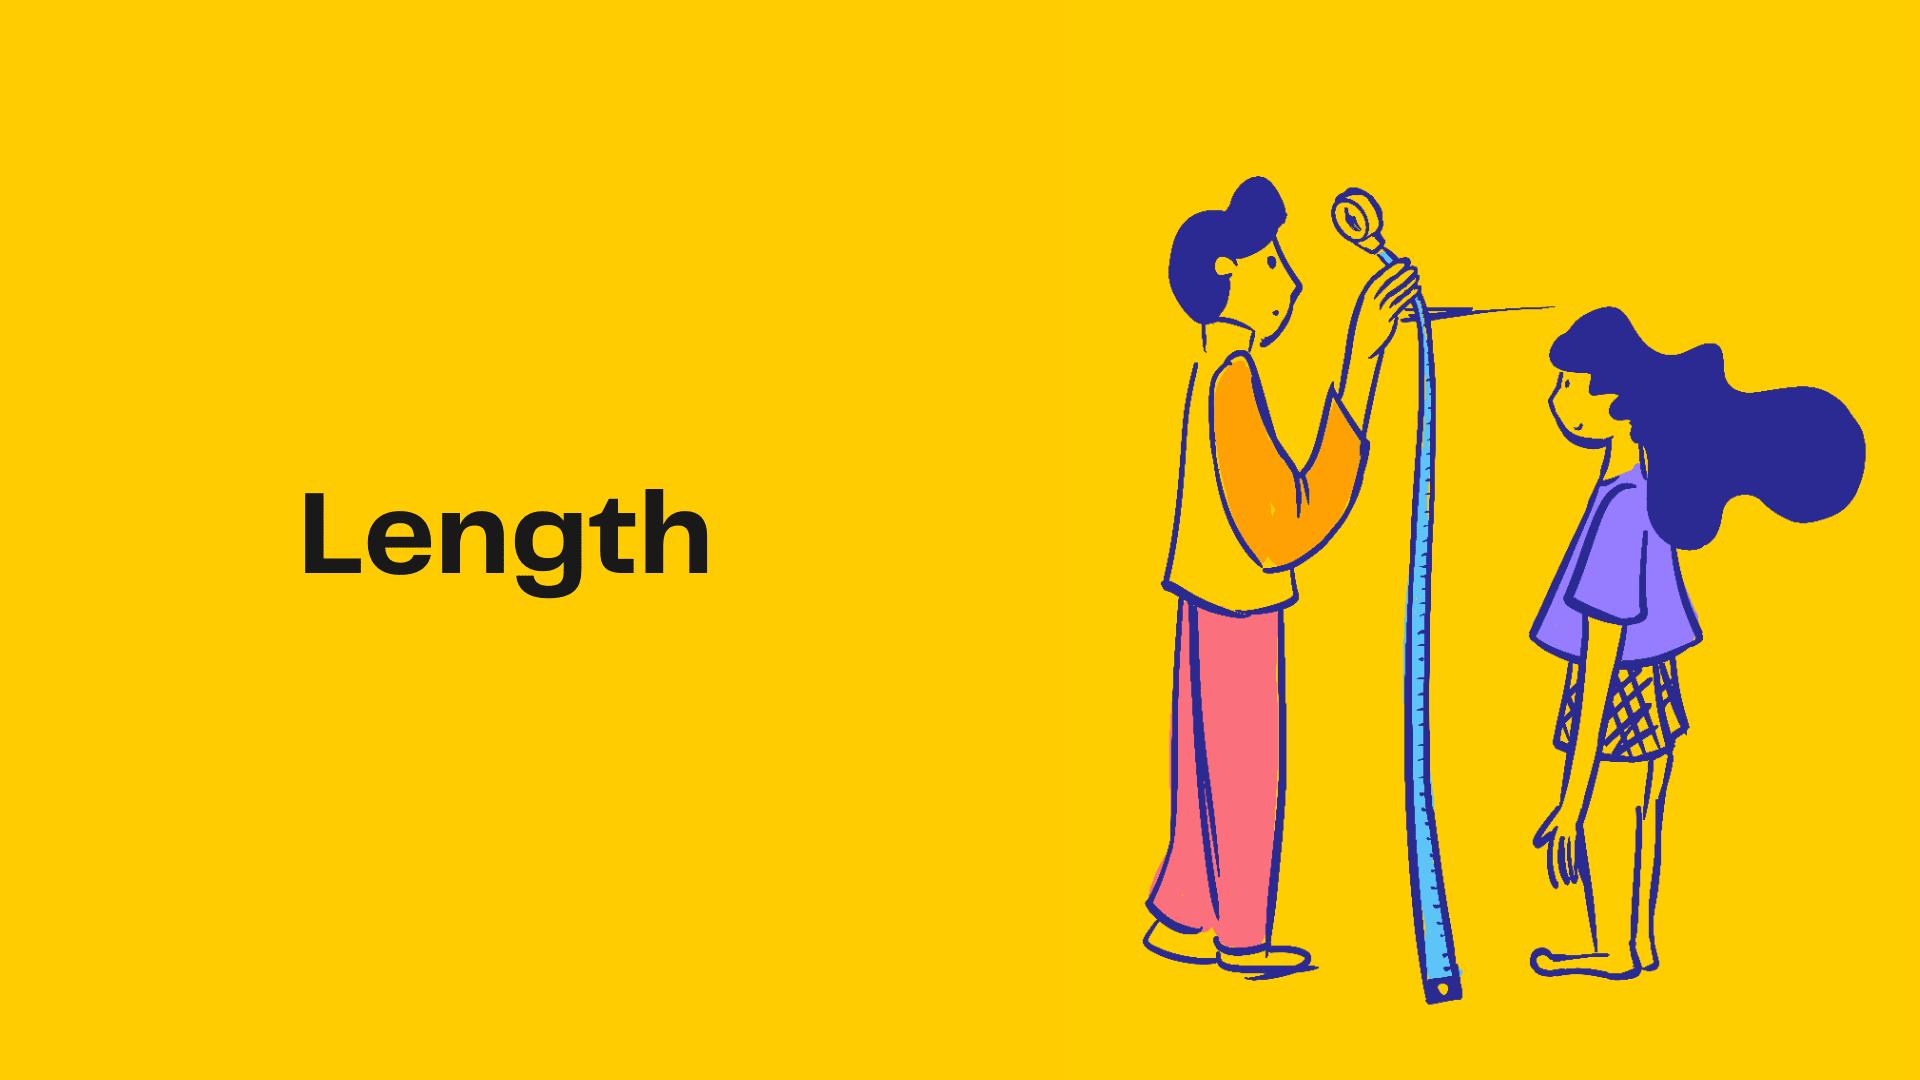 Length poster